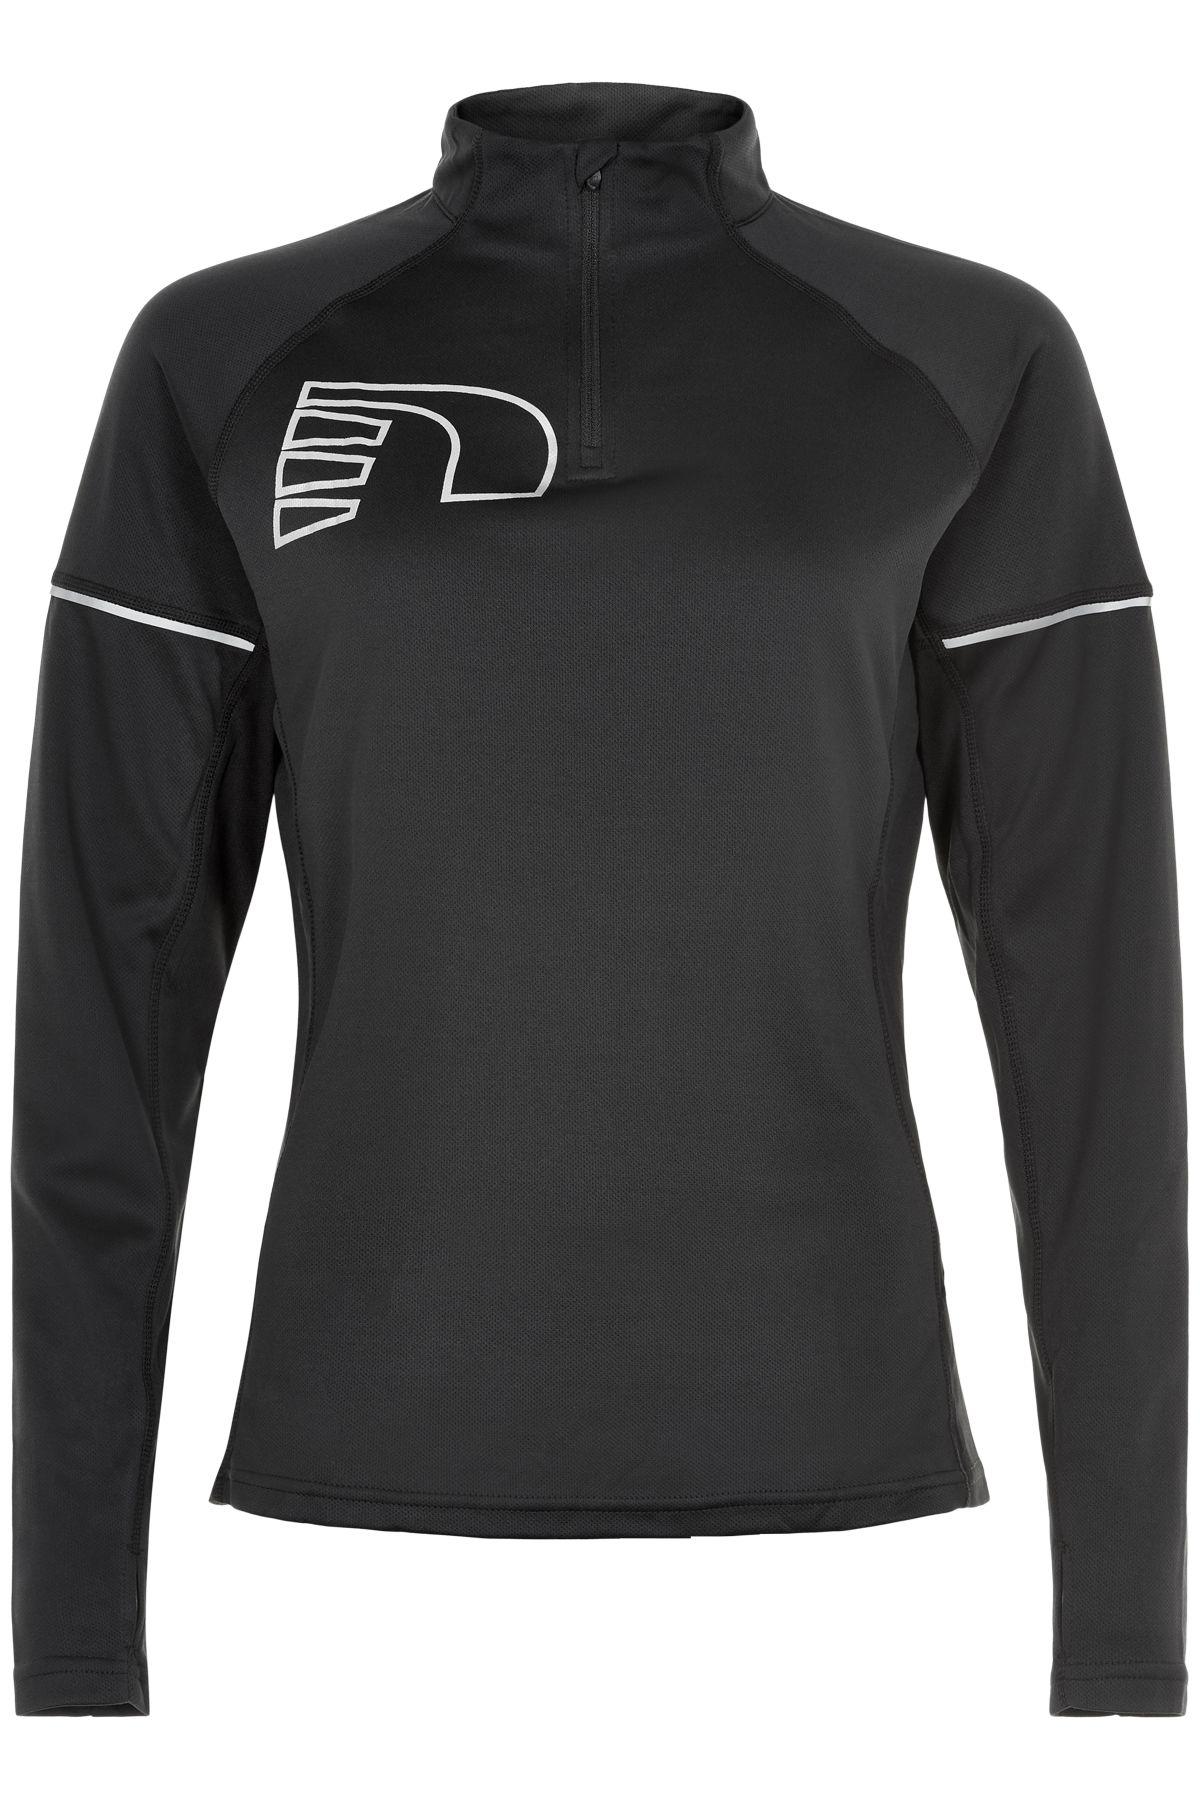 Newline Lady Core Zip Neck Shirt (Black)